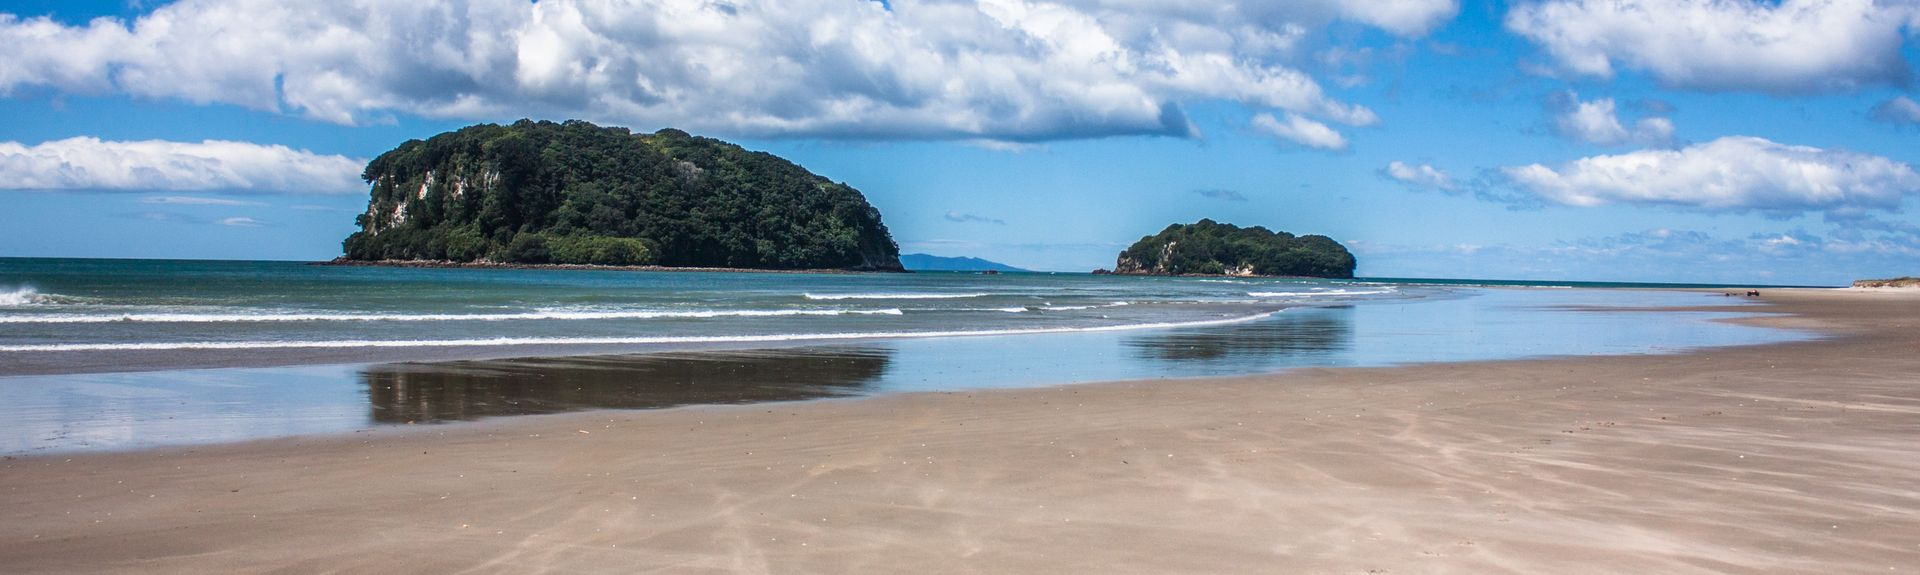 Whangamata, Thames-Coromandel, Waikato, New Zealand